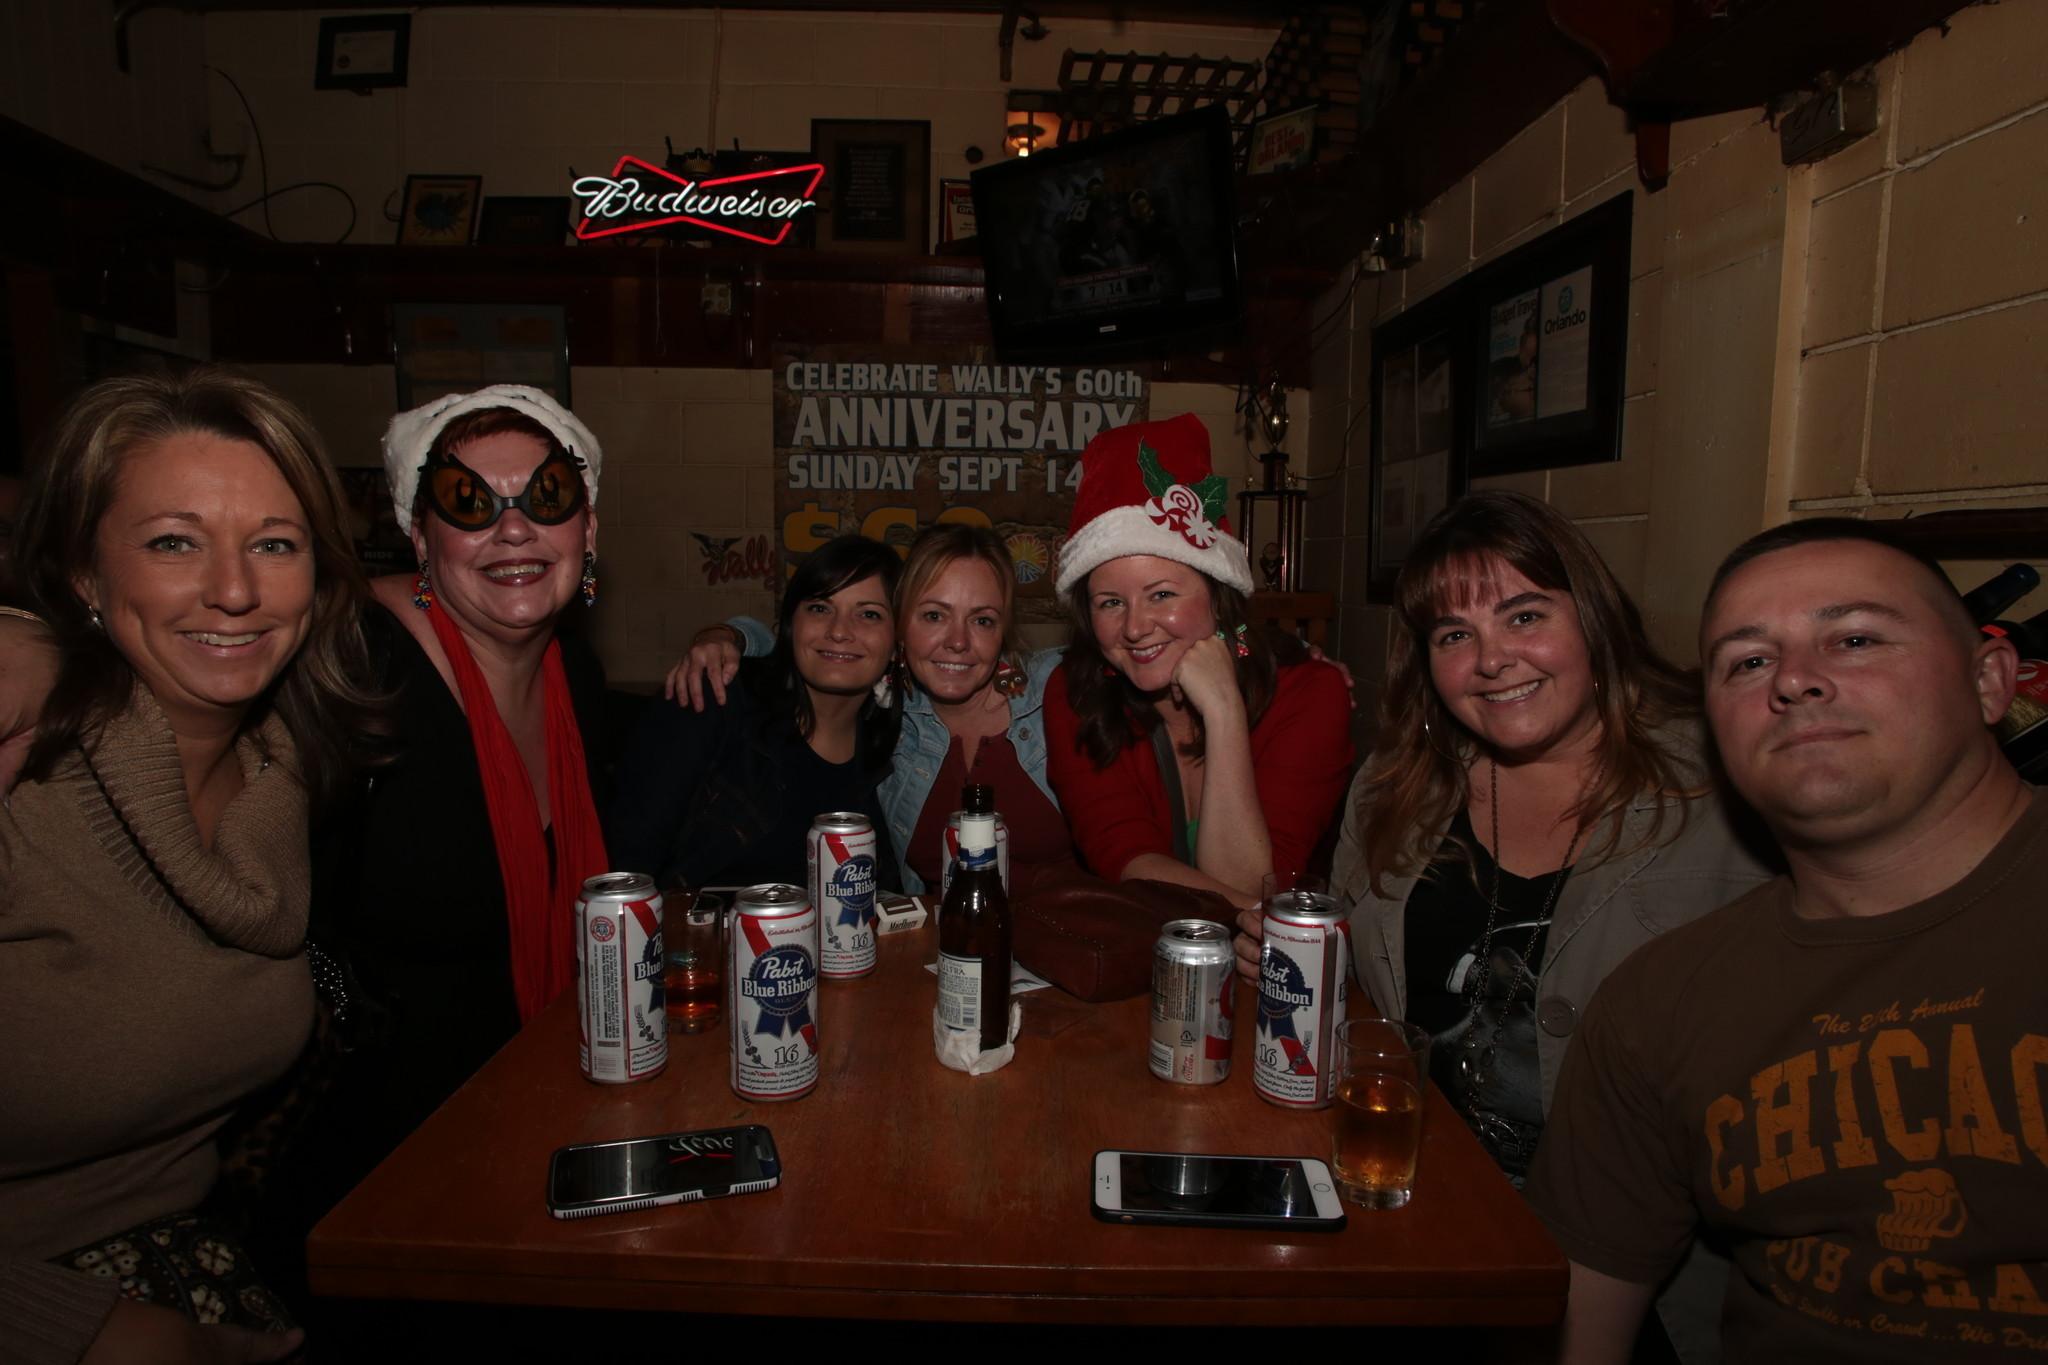 Orlando bars open on Christmas - Orlando Sentinel